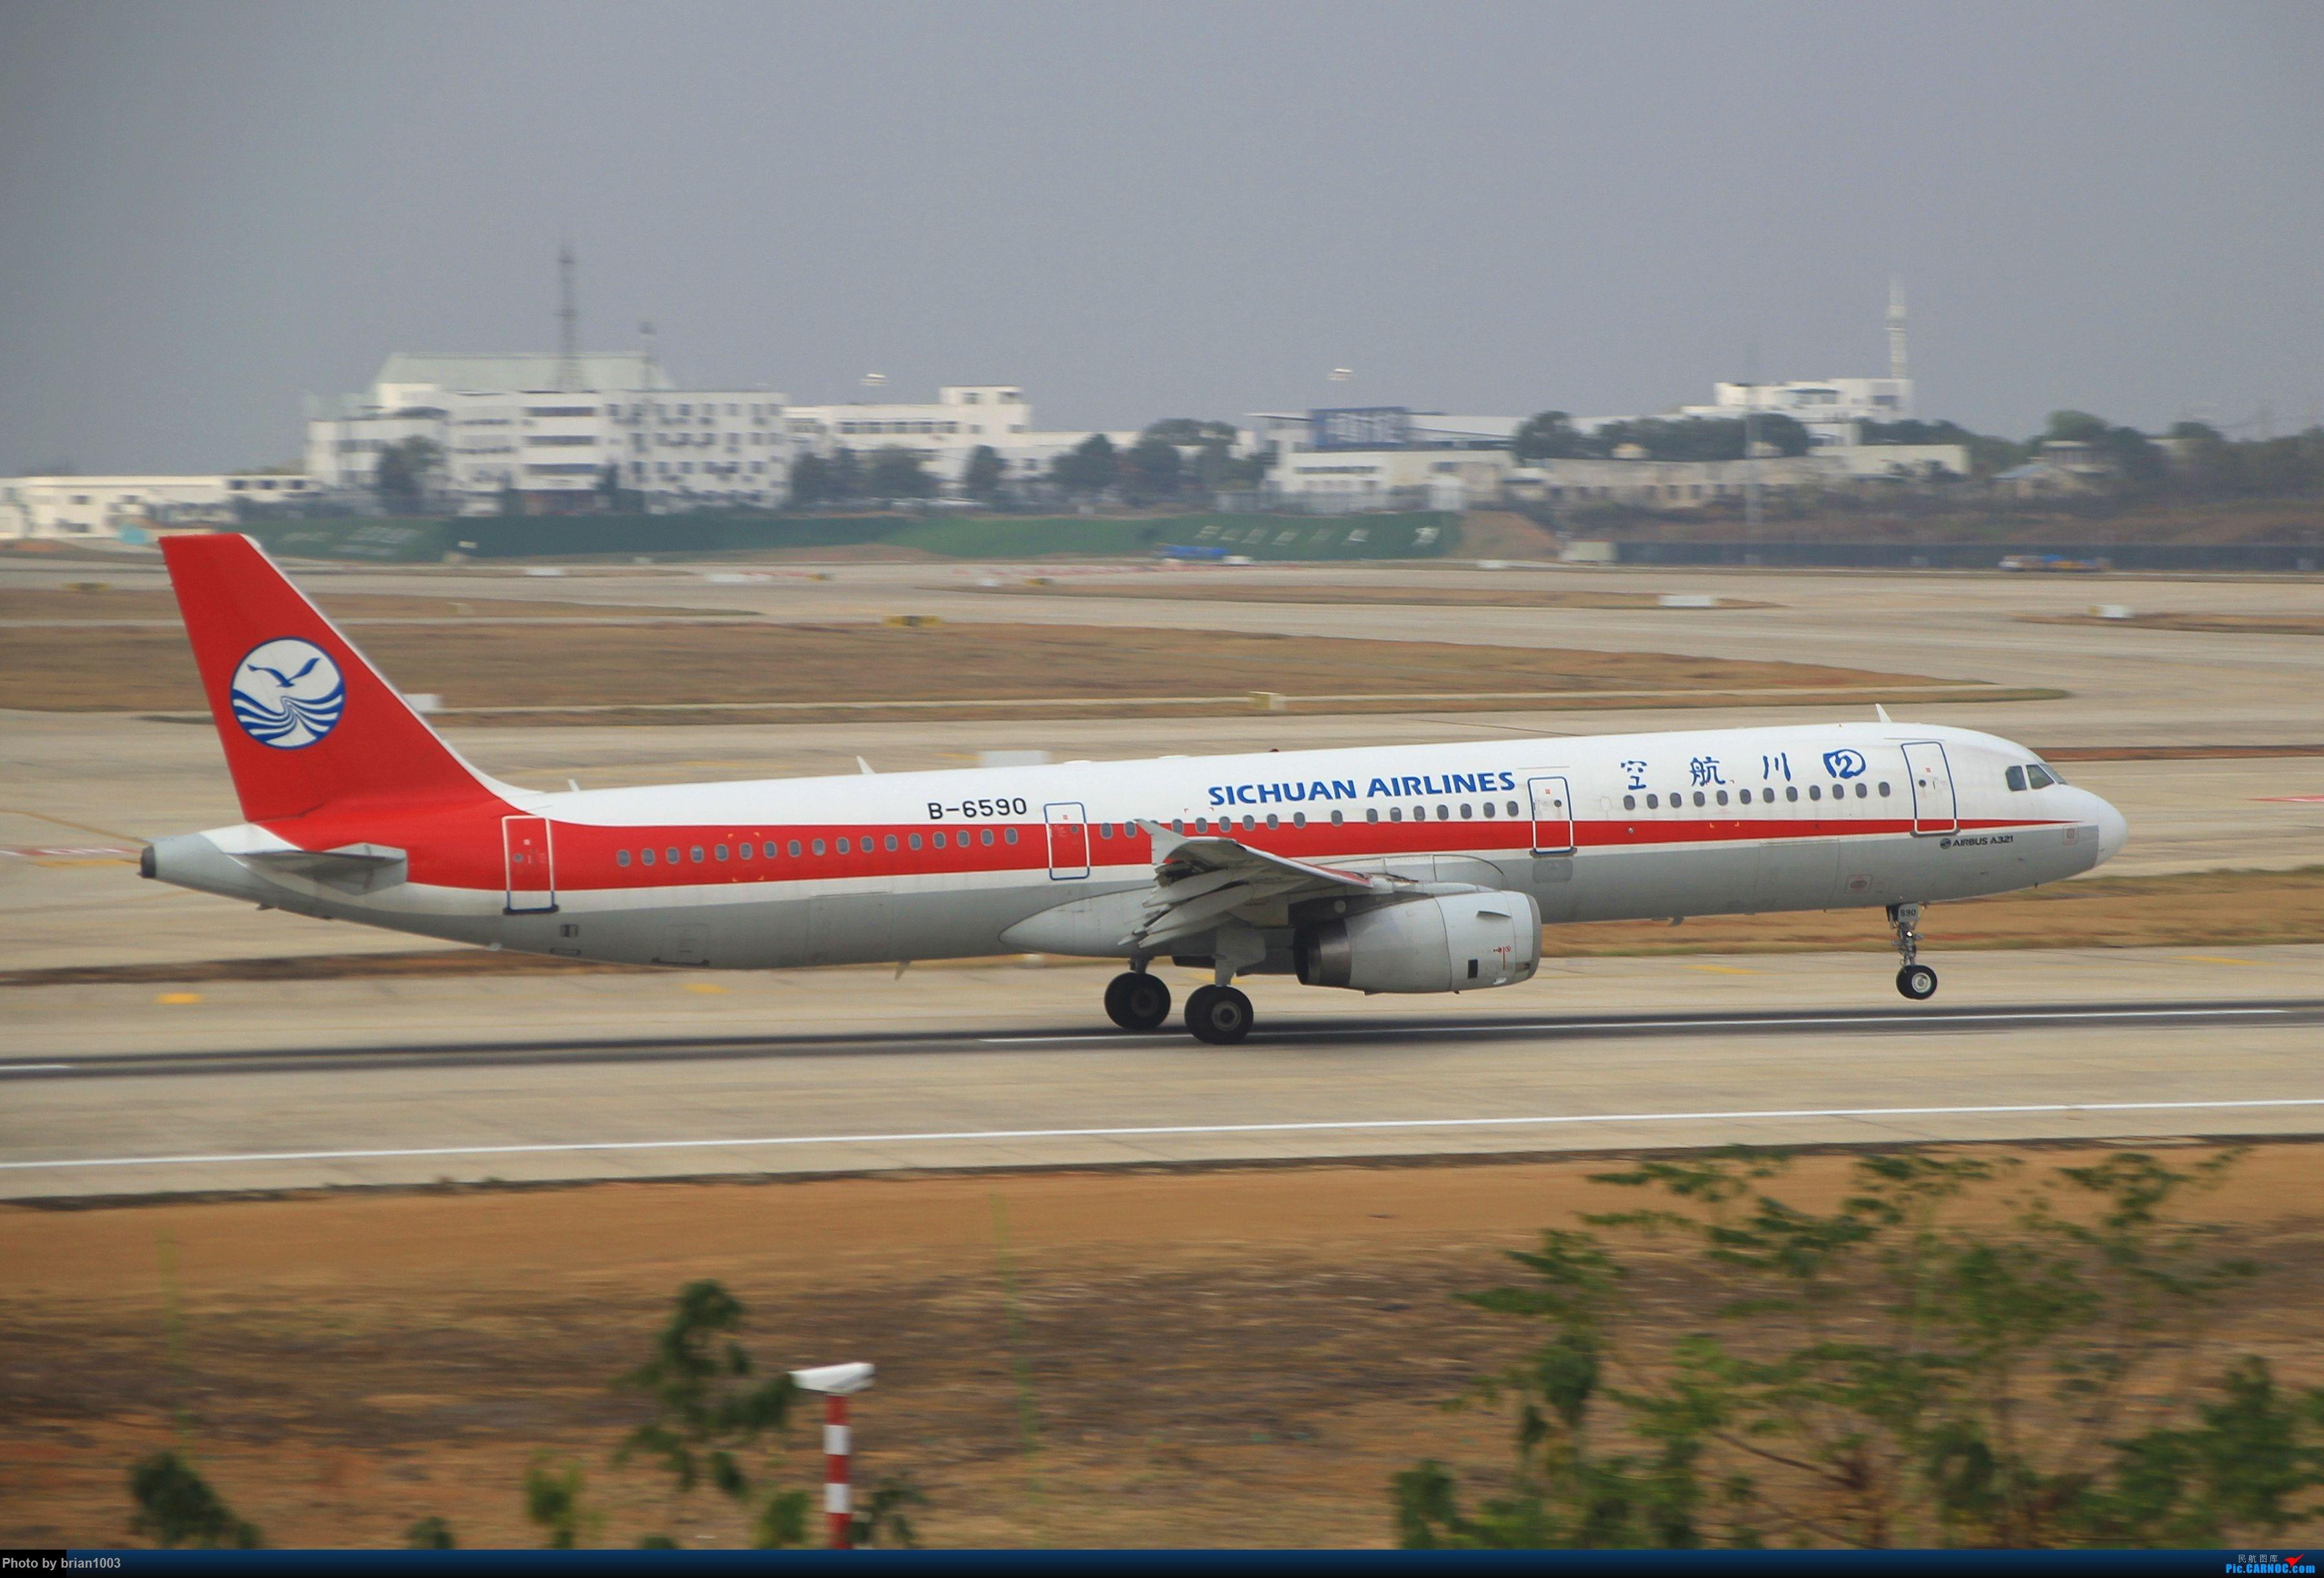 Re:[原创]WUH武汉天河机场拍机之新航季来的海航333和幸福的738 AIRBUS A321-200 B-6590 中国武汉天河国际机场